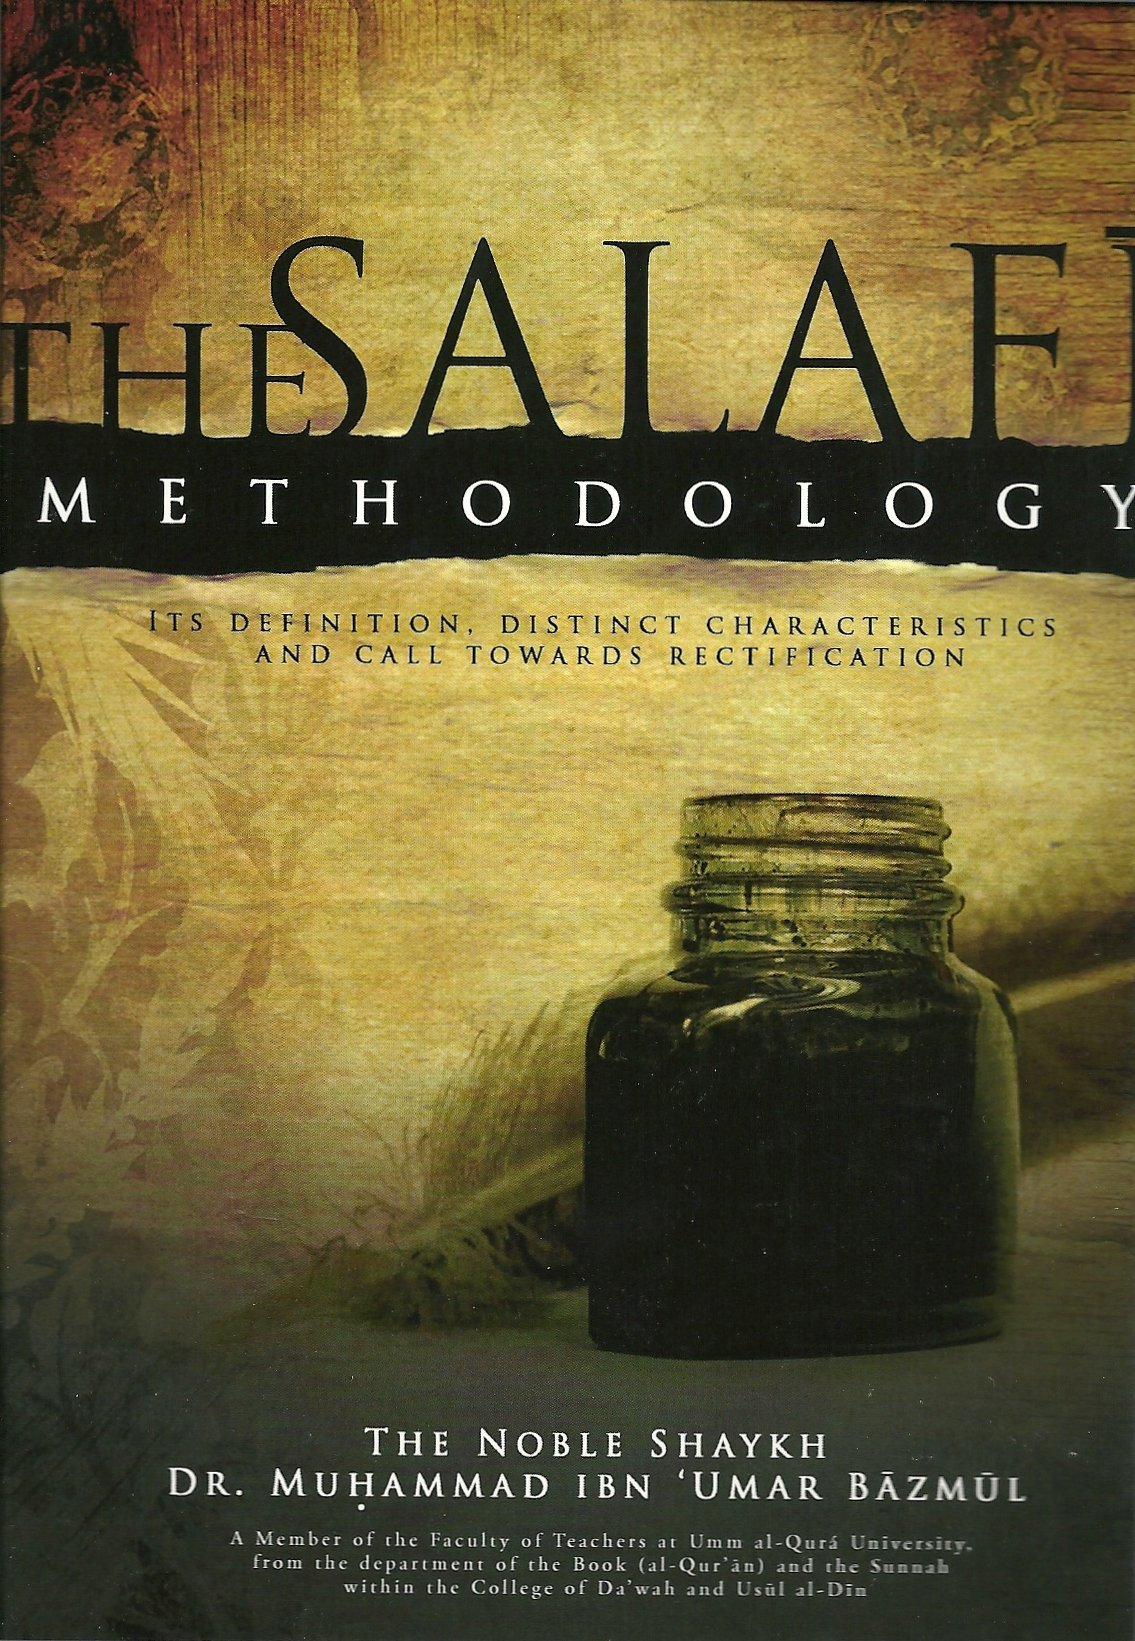 The Salafi Methodology Dr M Ibn Umar Bazmul 9780982808412 Amazon Blue Circuit Board Design Passport Holder Zazzle Amazoncom Books